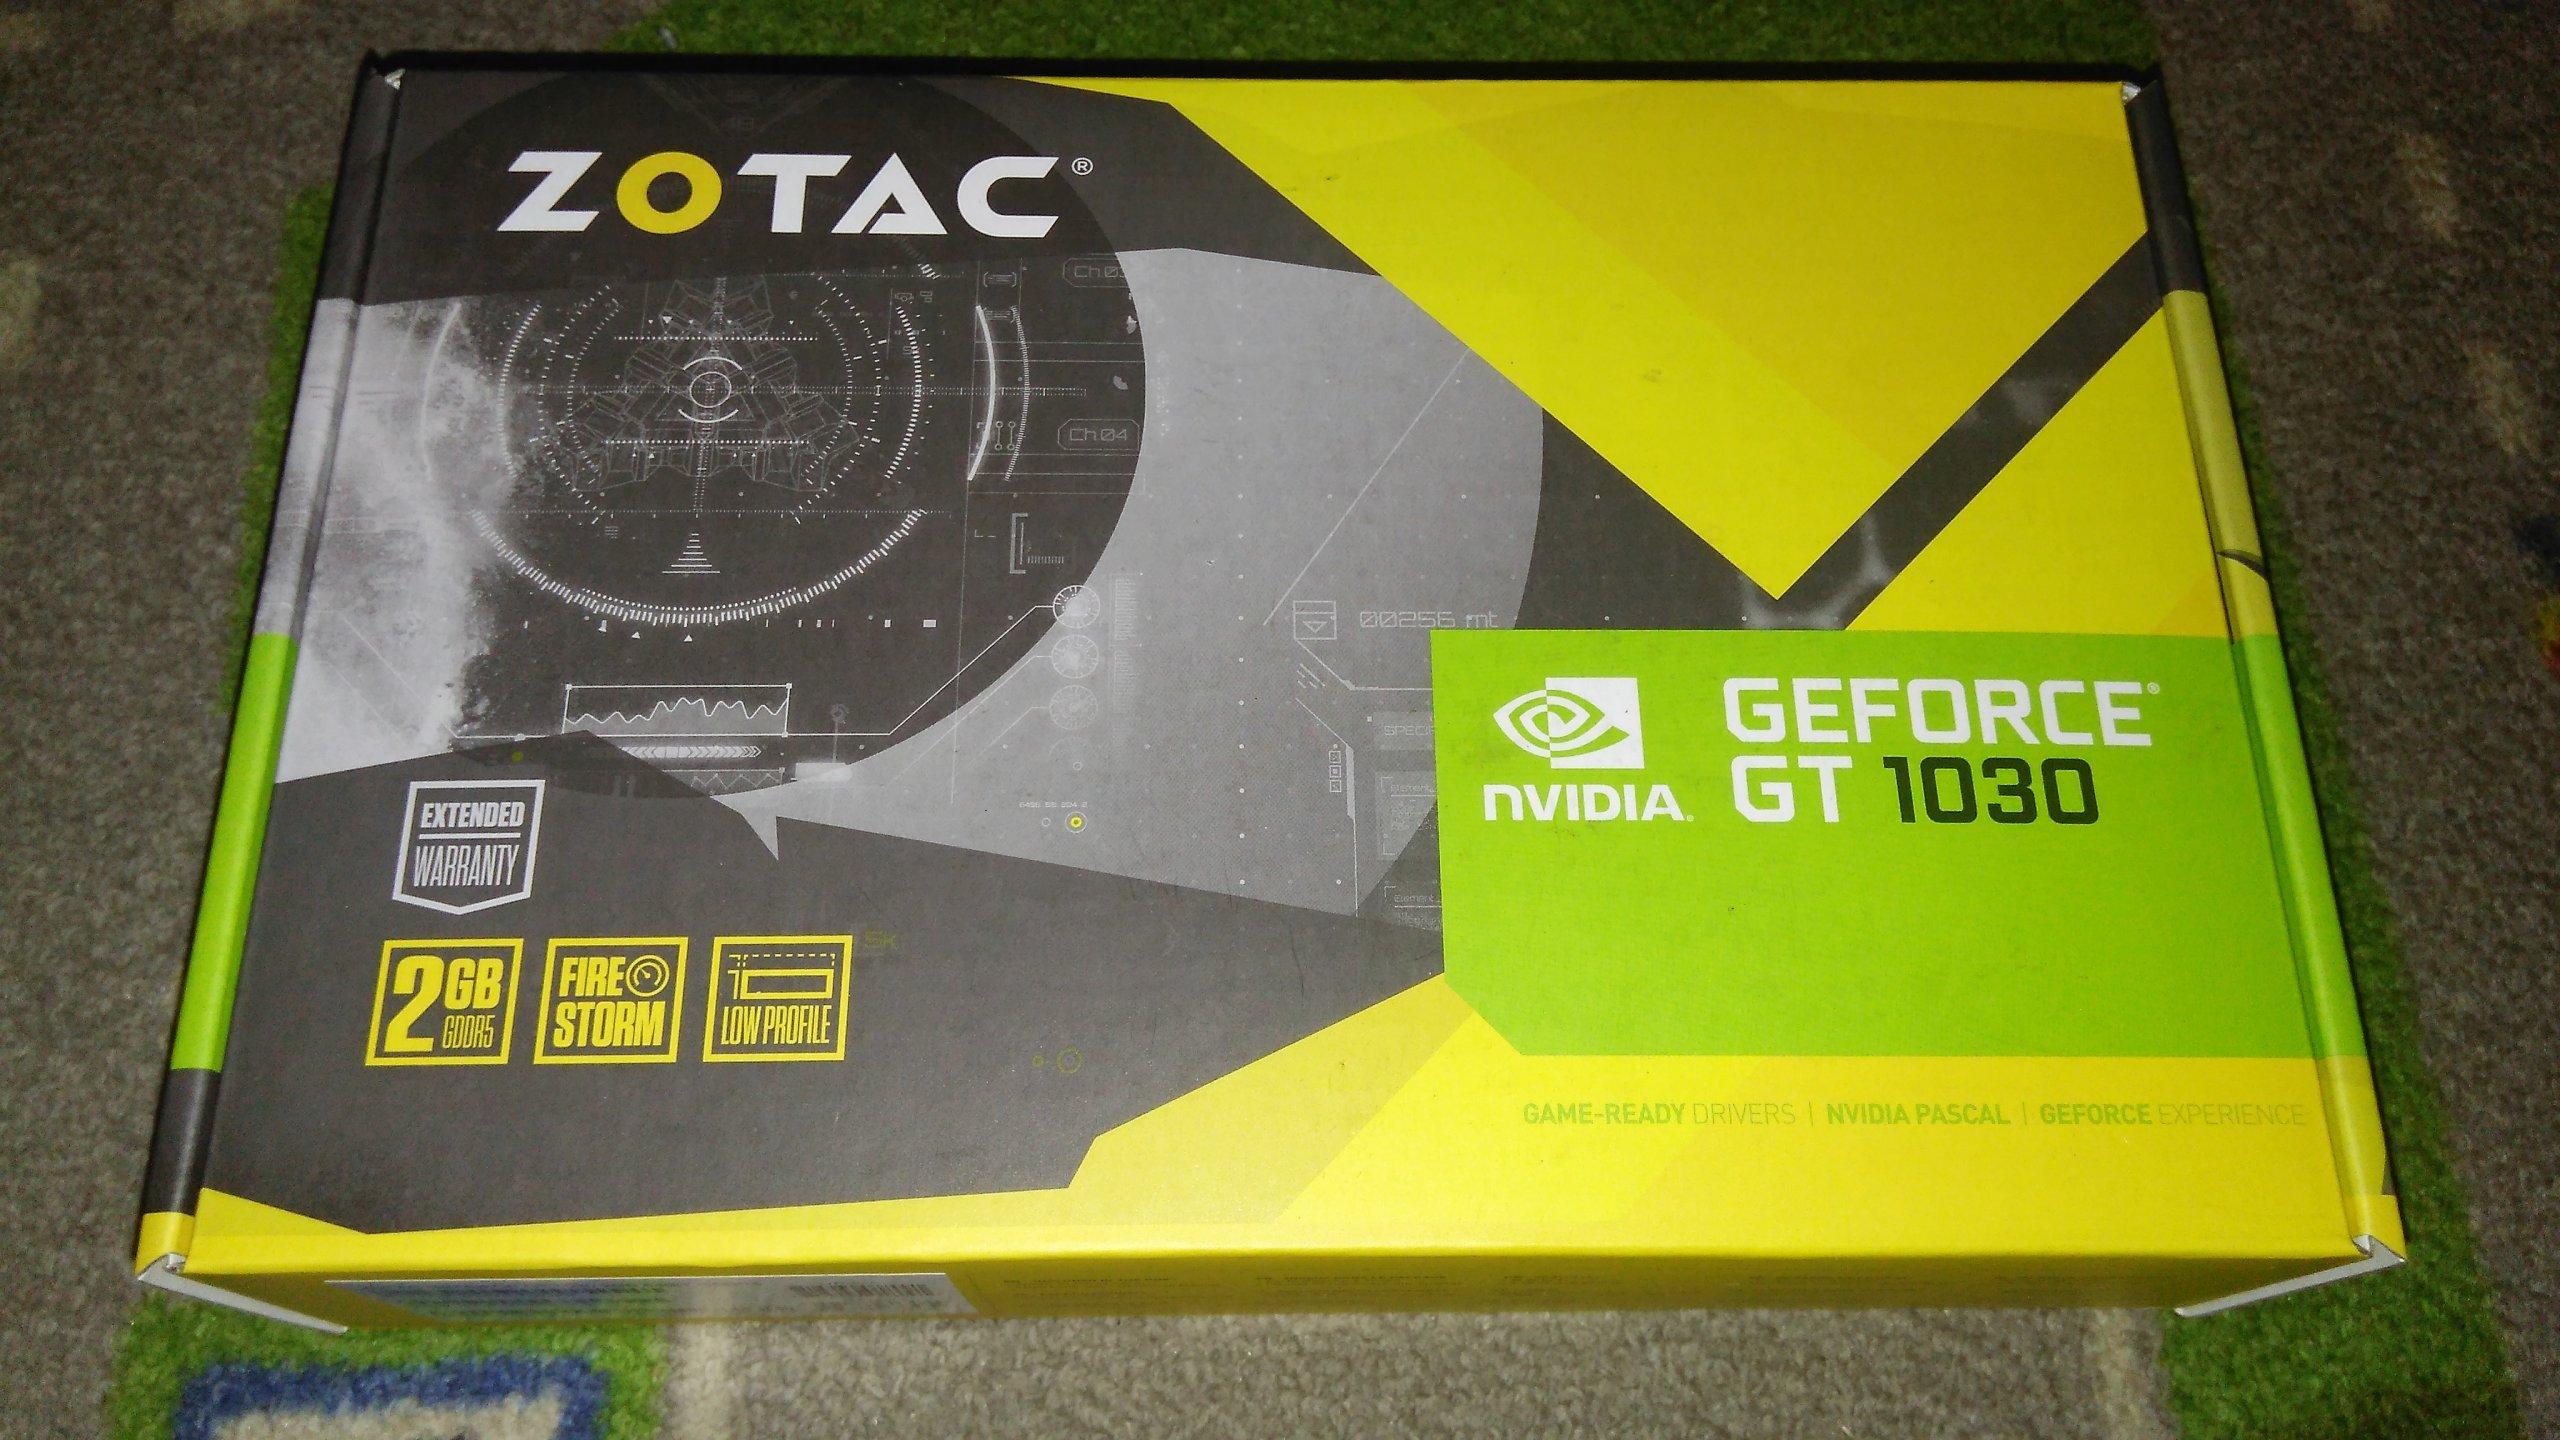 Karta Zotac Geforce Gt 1030 2gb Gddr5 Hdmi Vga 7185986237